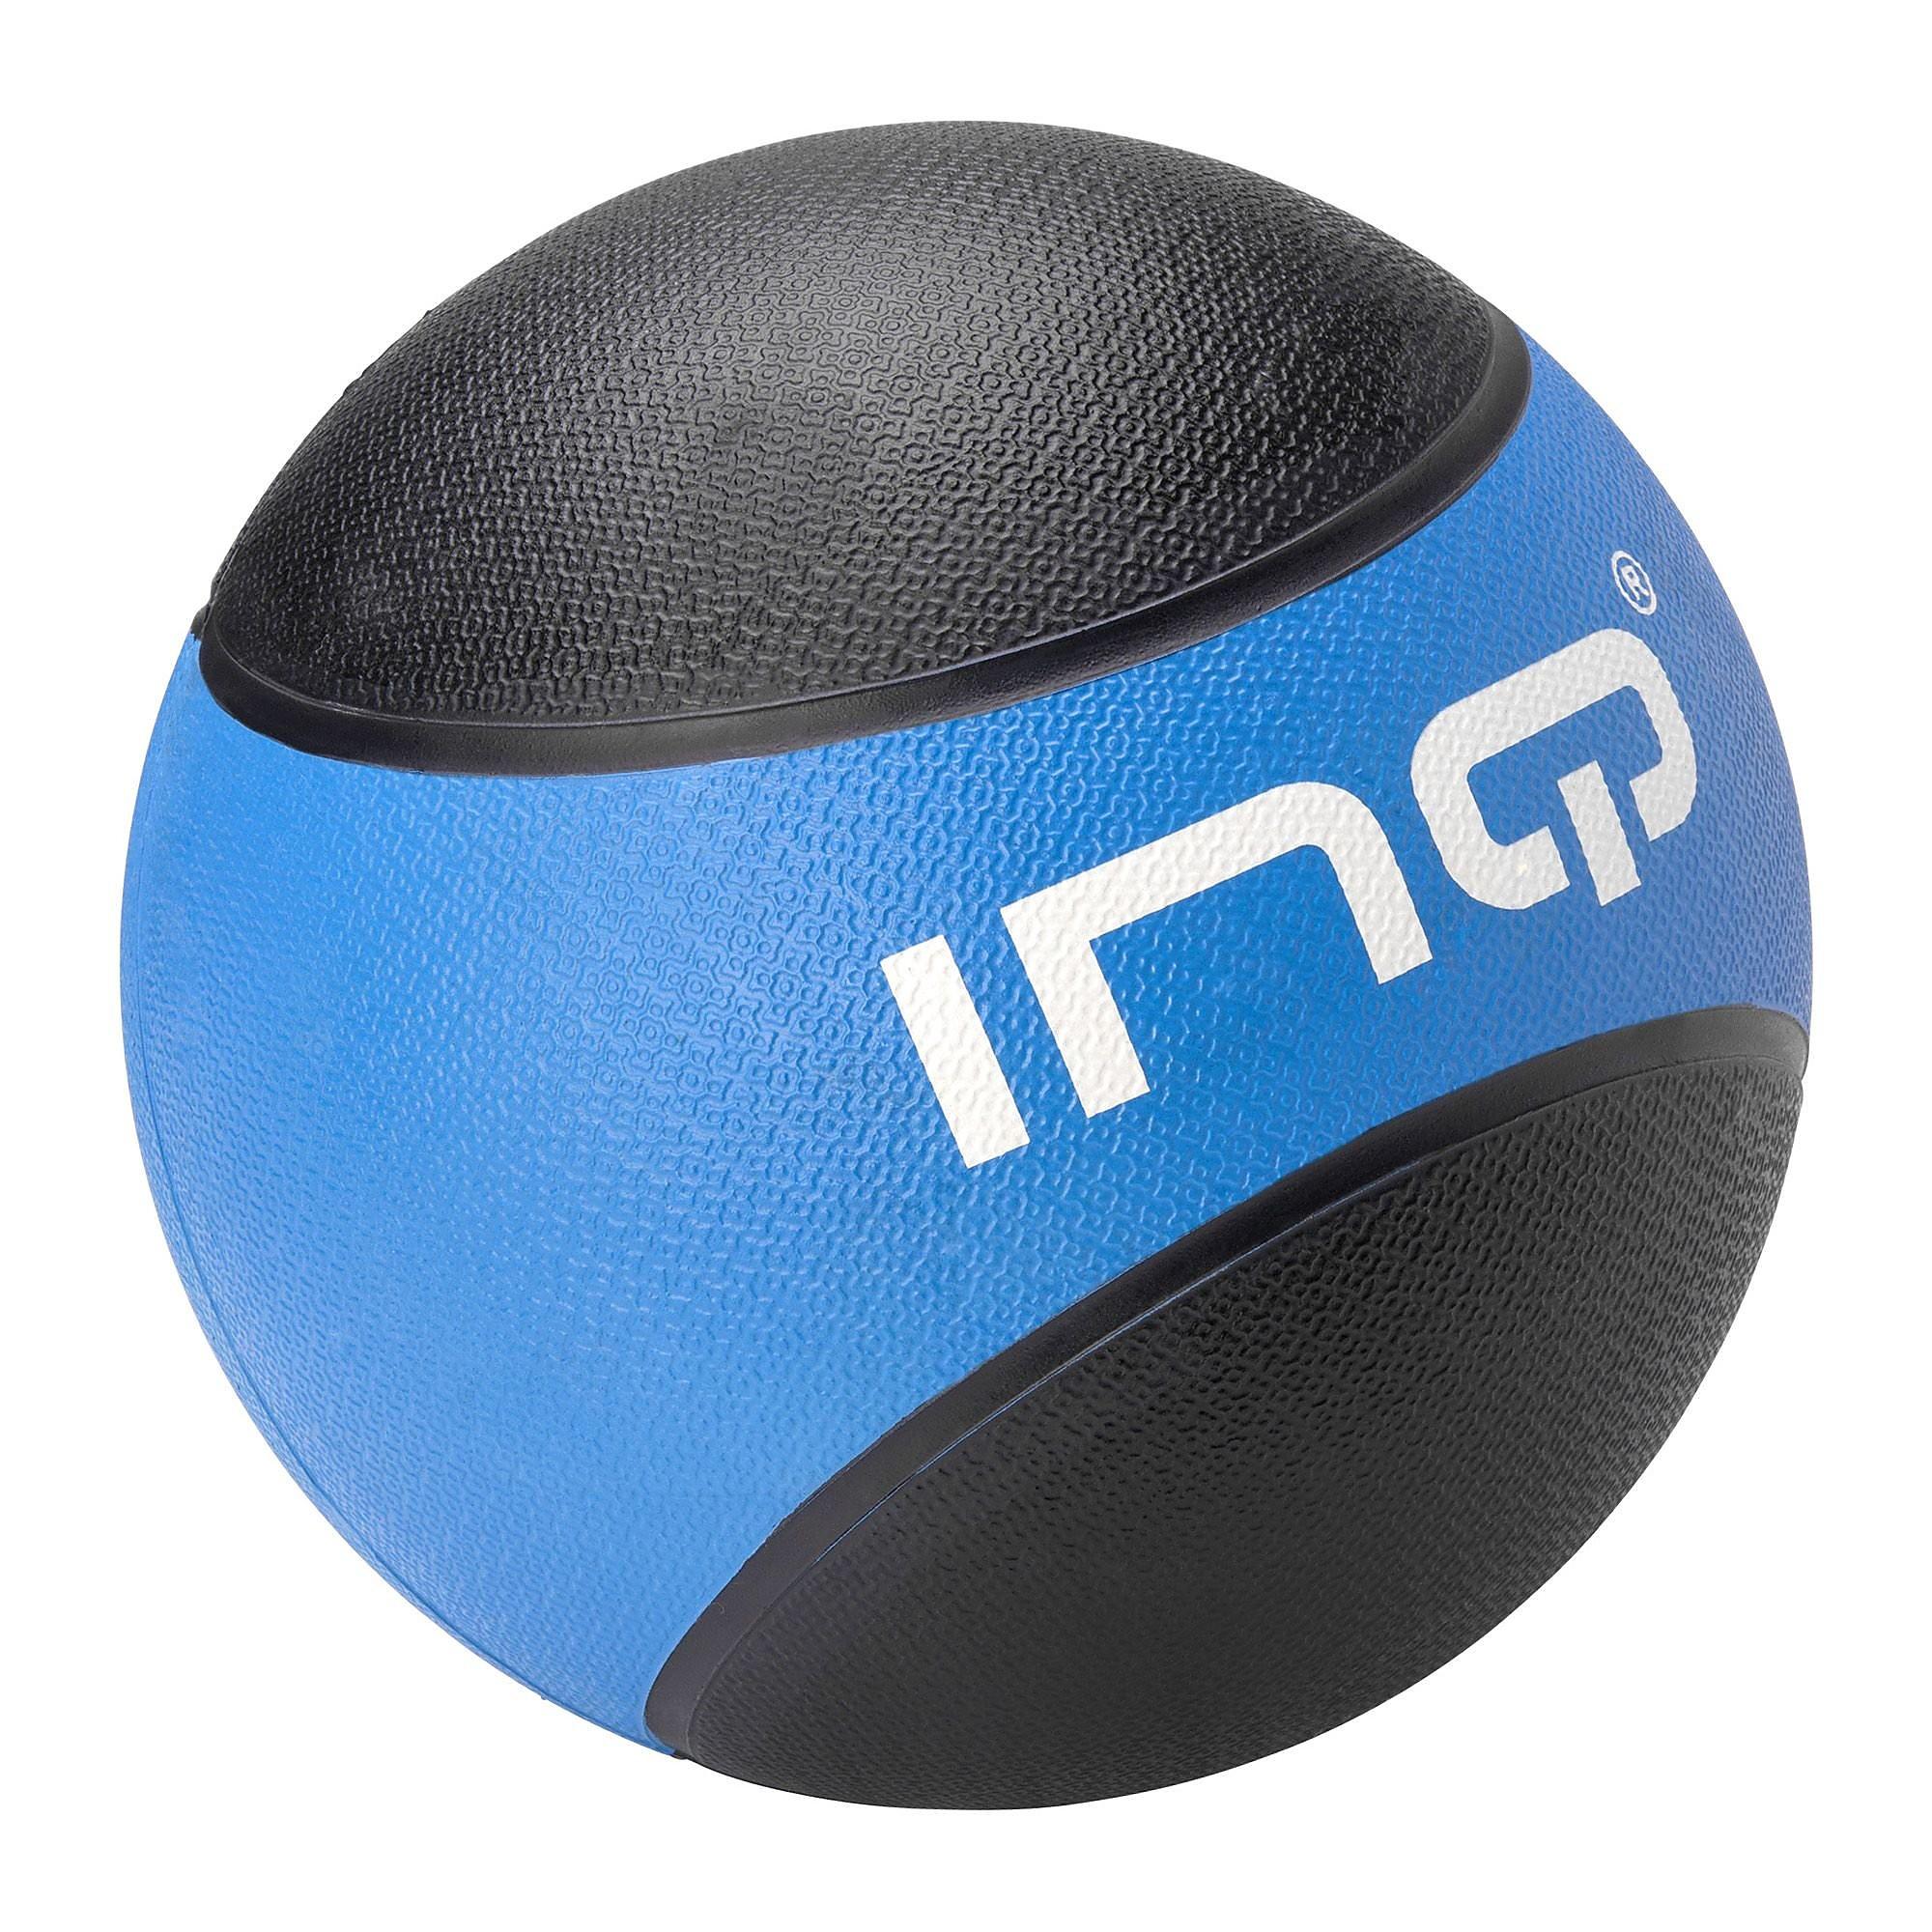 INQ MEDICINE BALL 4 KILOGRAM